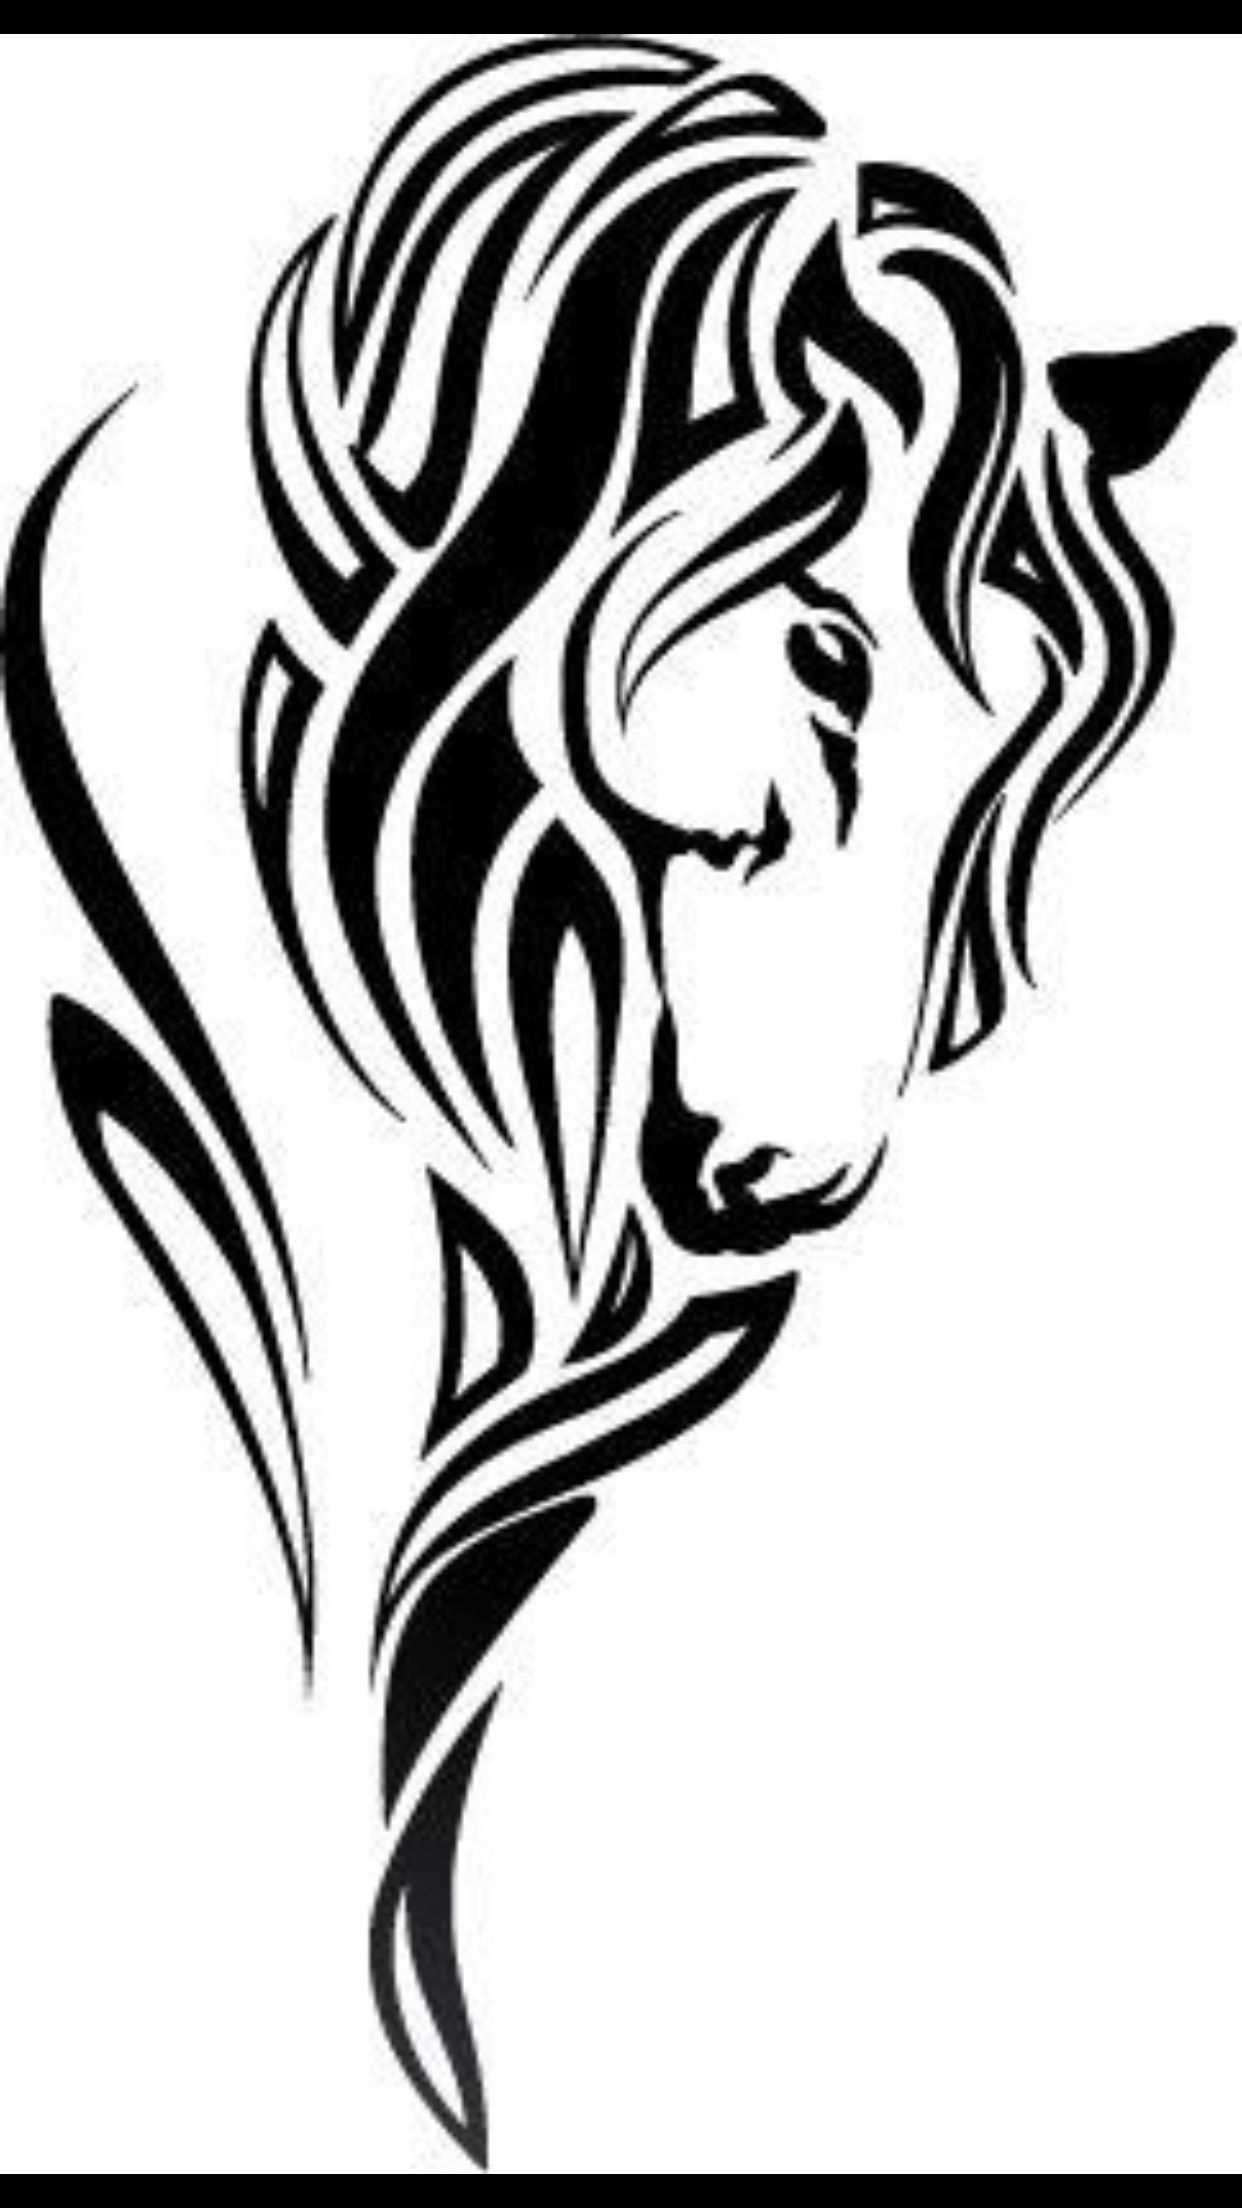 Horse Tattoo Tribal Style Imagenes Bonitas Pinterest Pferde In Pferde Schablonen Pferd Tattoo Pferde Silhouette Tattoo Pferd